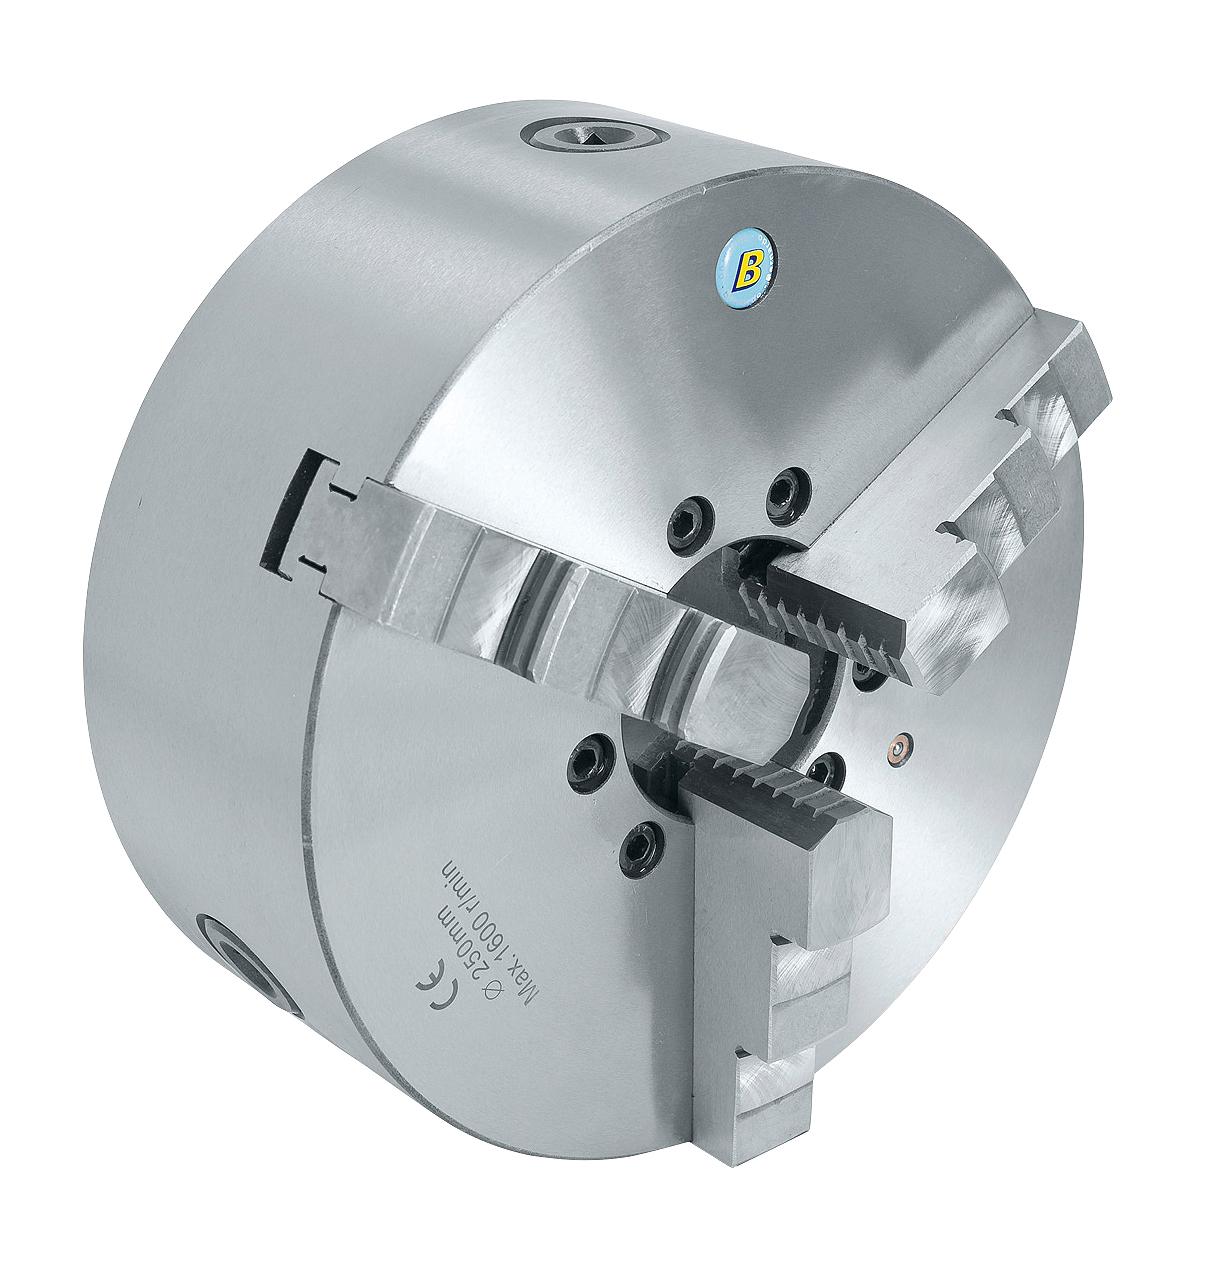 3 bakket centrerpatron standard DK11-315/D8